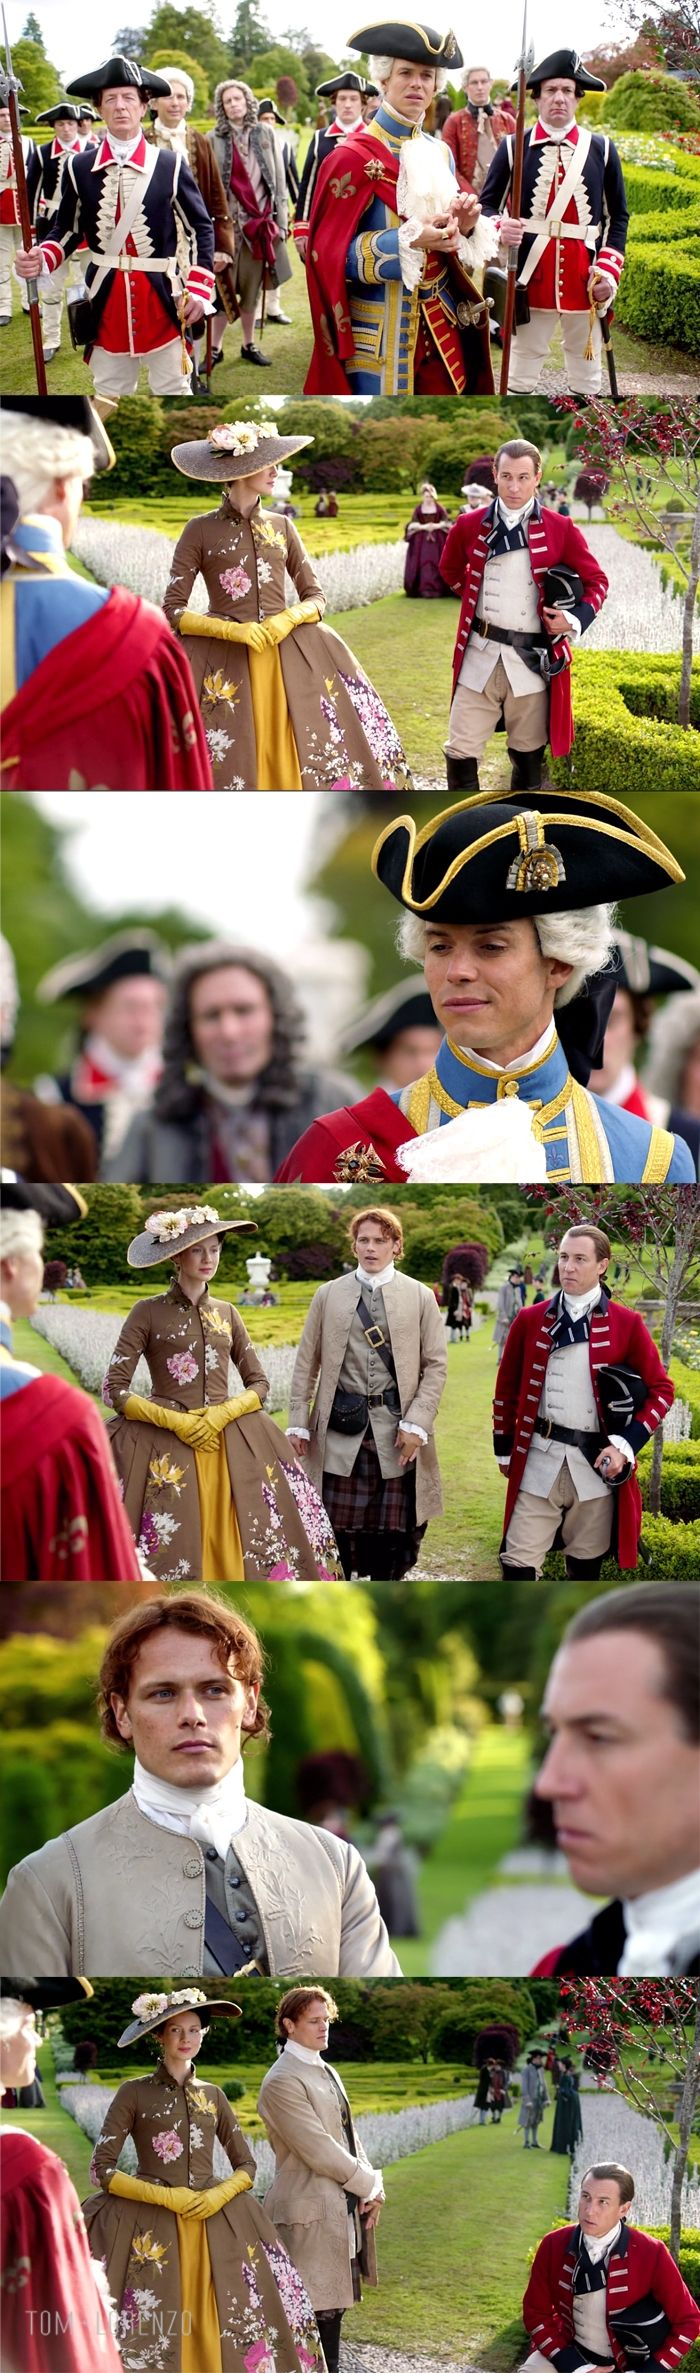 Outlander-Style-Season-2-Episode-5-TV-Series-Startz-Costumes-Terry-Dresbach-Tom-Lorenzo-Site (15)